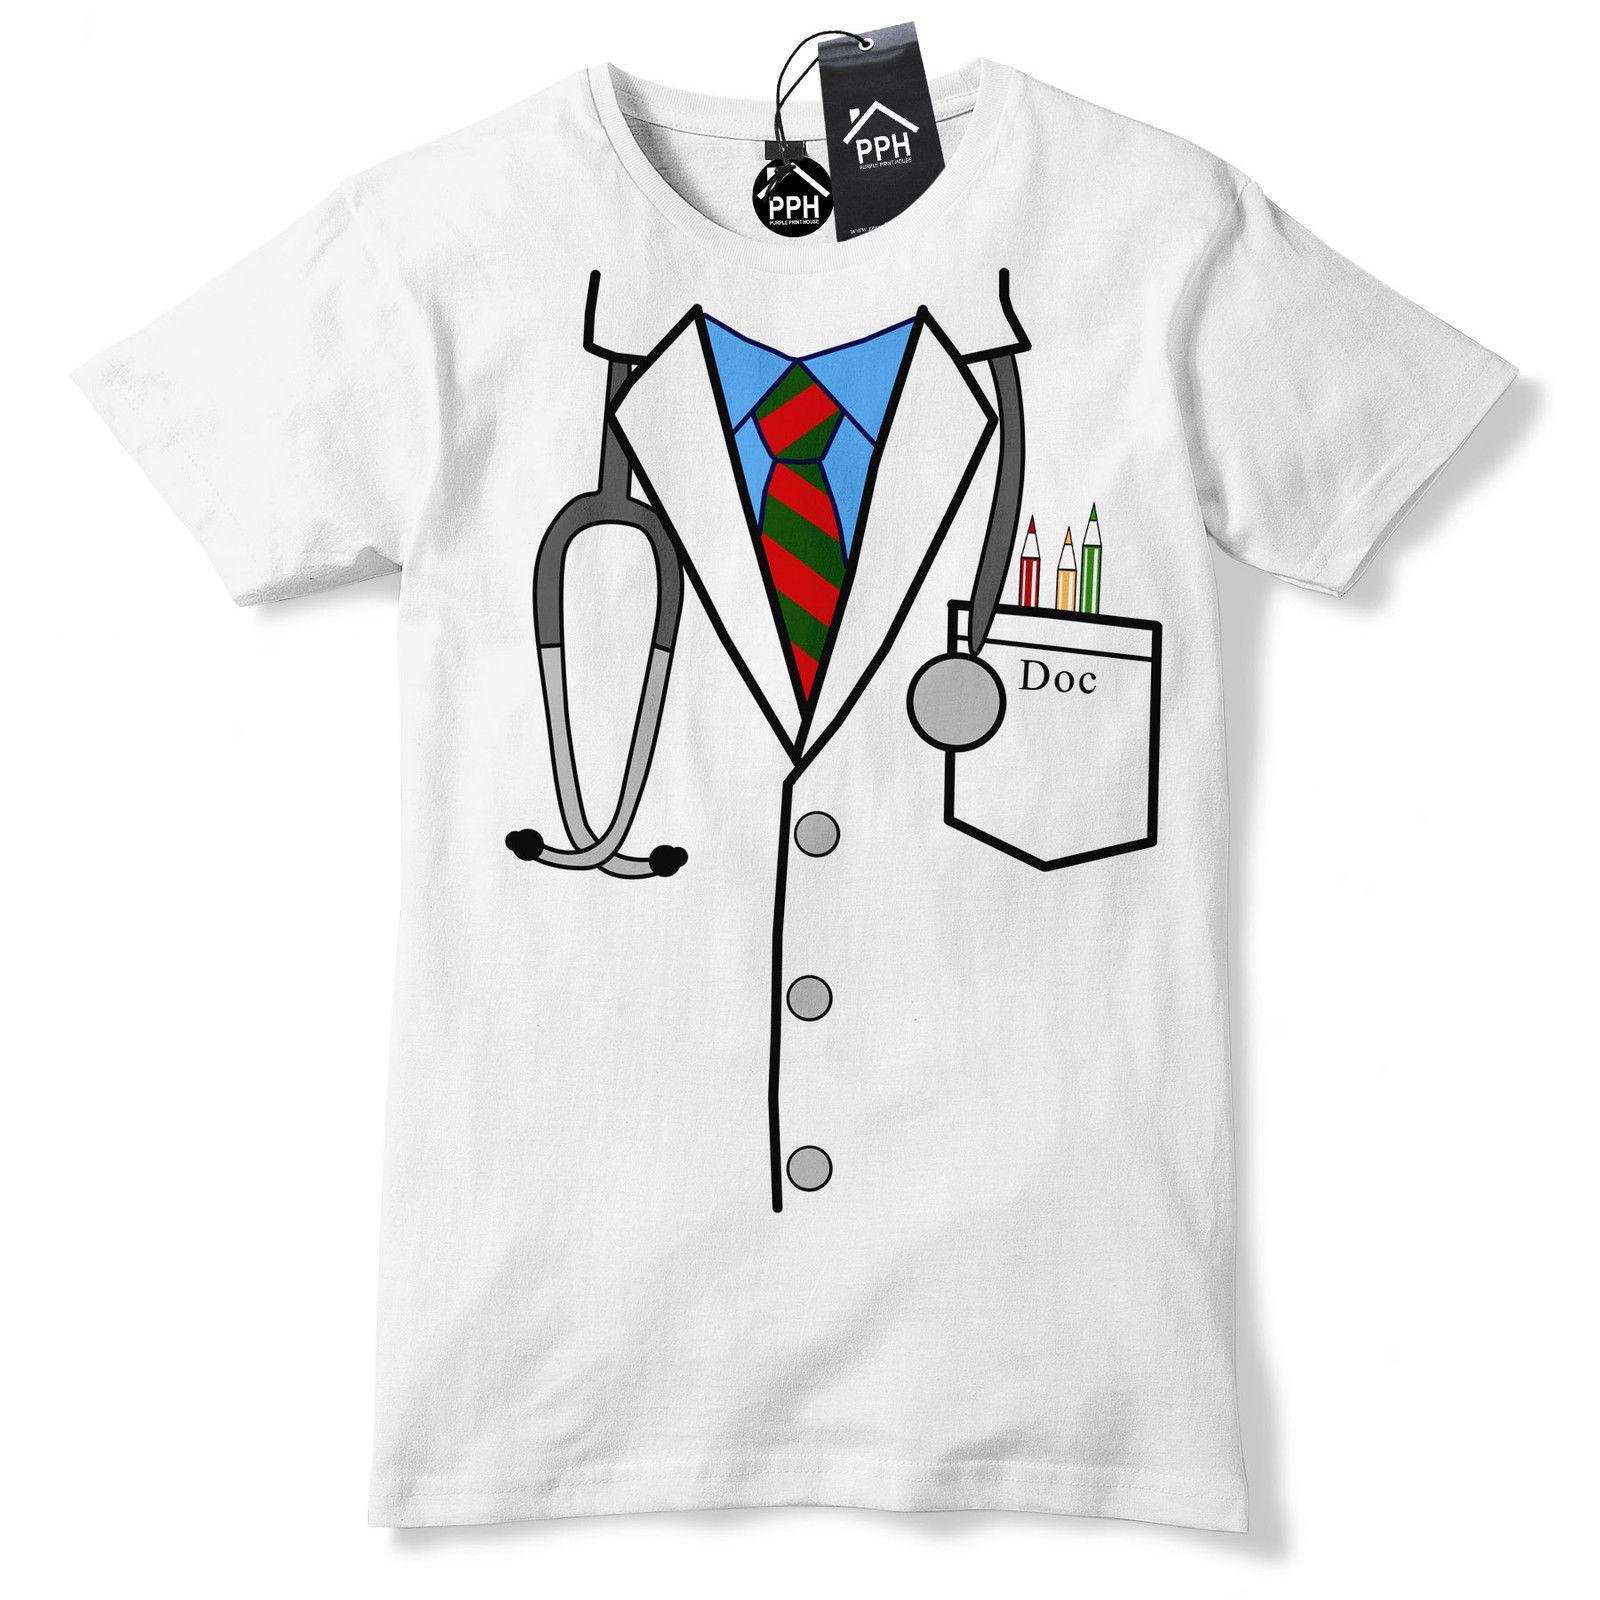 29b1ac67f9 Doctor Uniform Funny T Shirt Novelty Gift Hospital Nurse Surgeon Gift Tshirt  547 Hipster O Neck Casual Short Sleeve New High Quality Long Sleeve Shirt T  ...